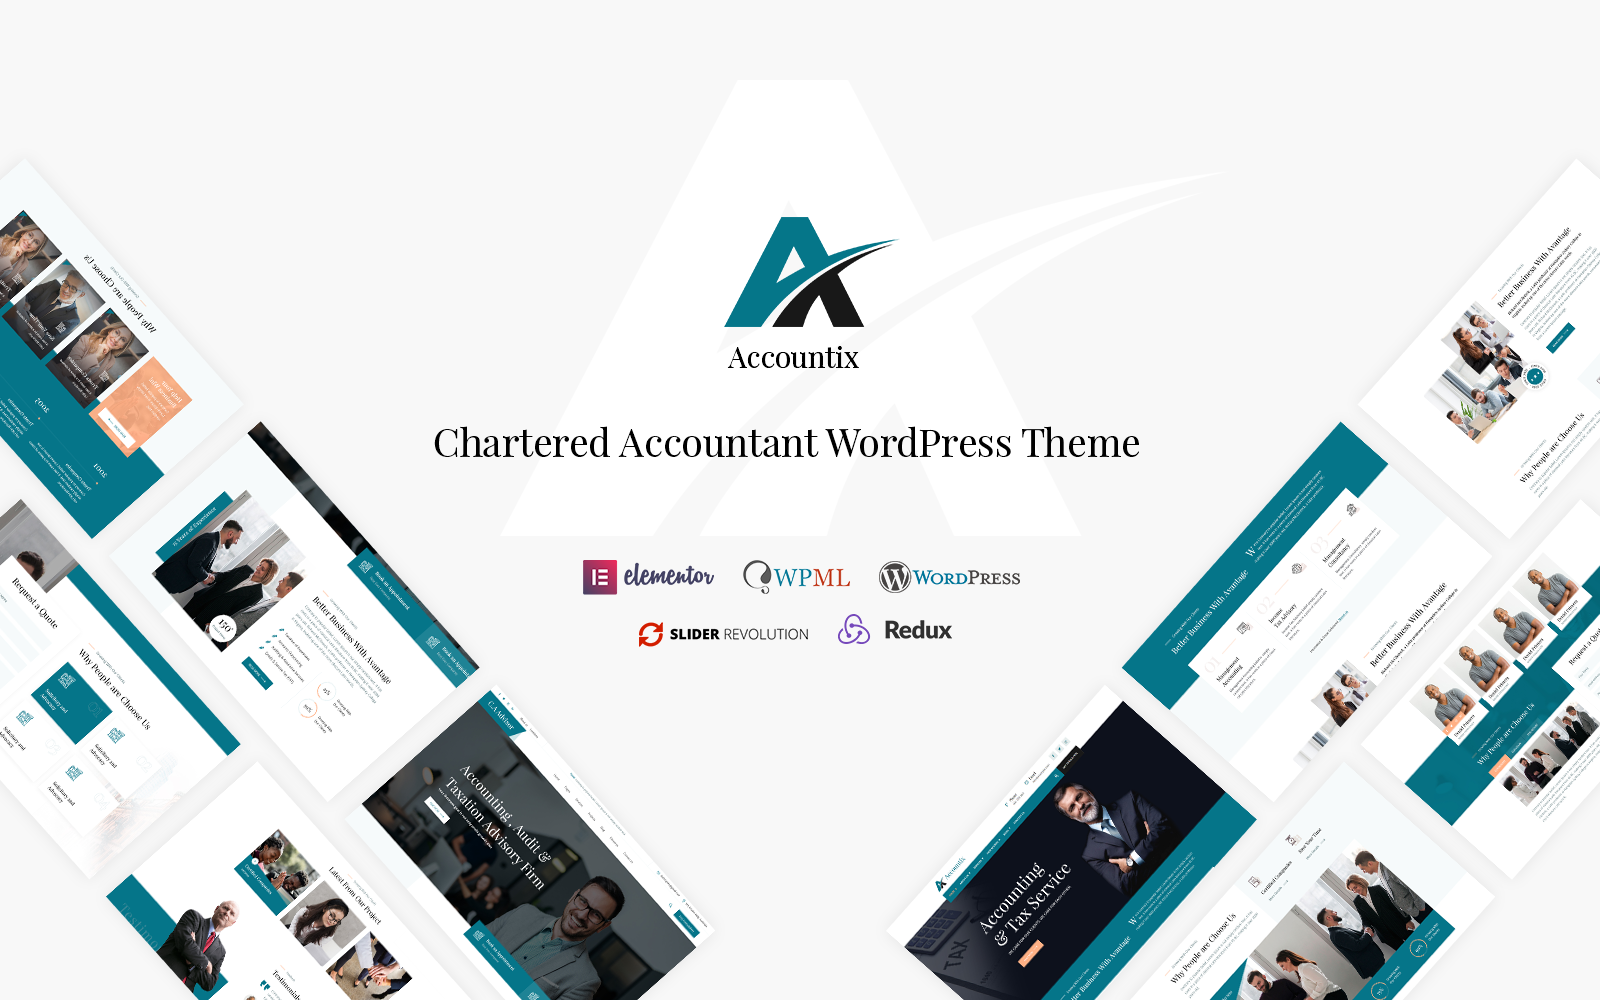 Accountix- Chartered Accountant WordPress Theme.